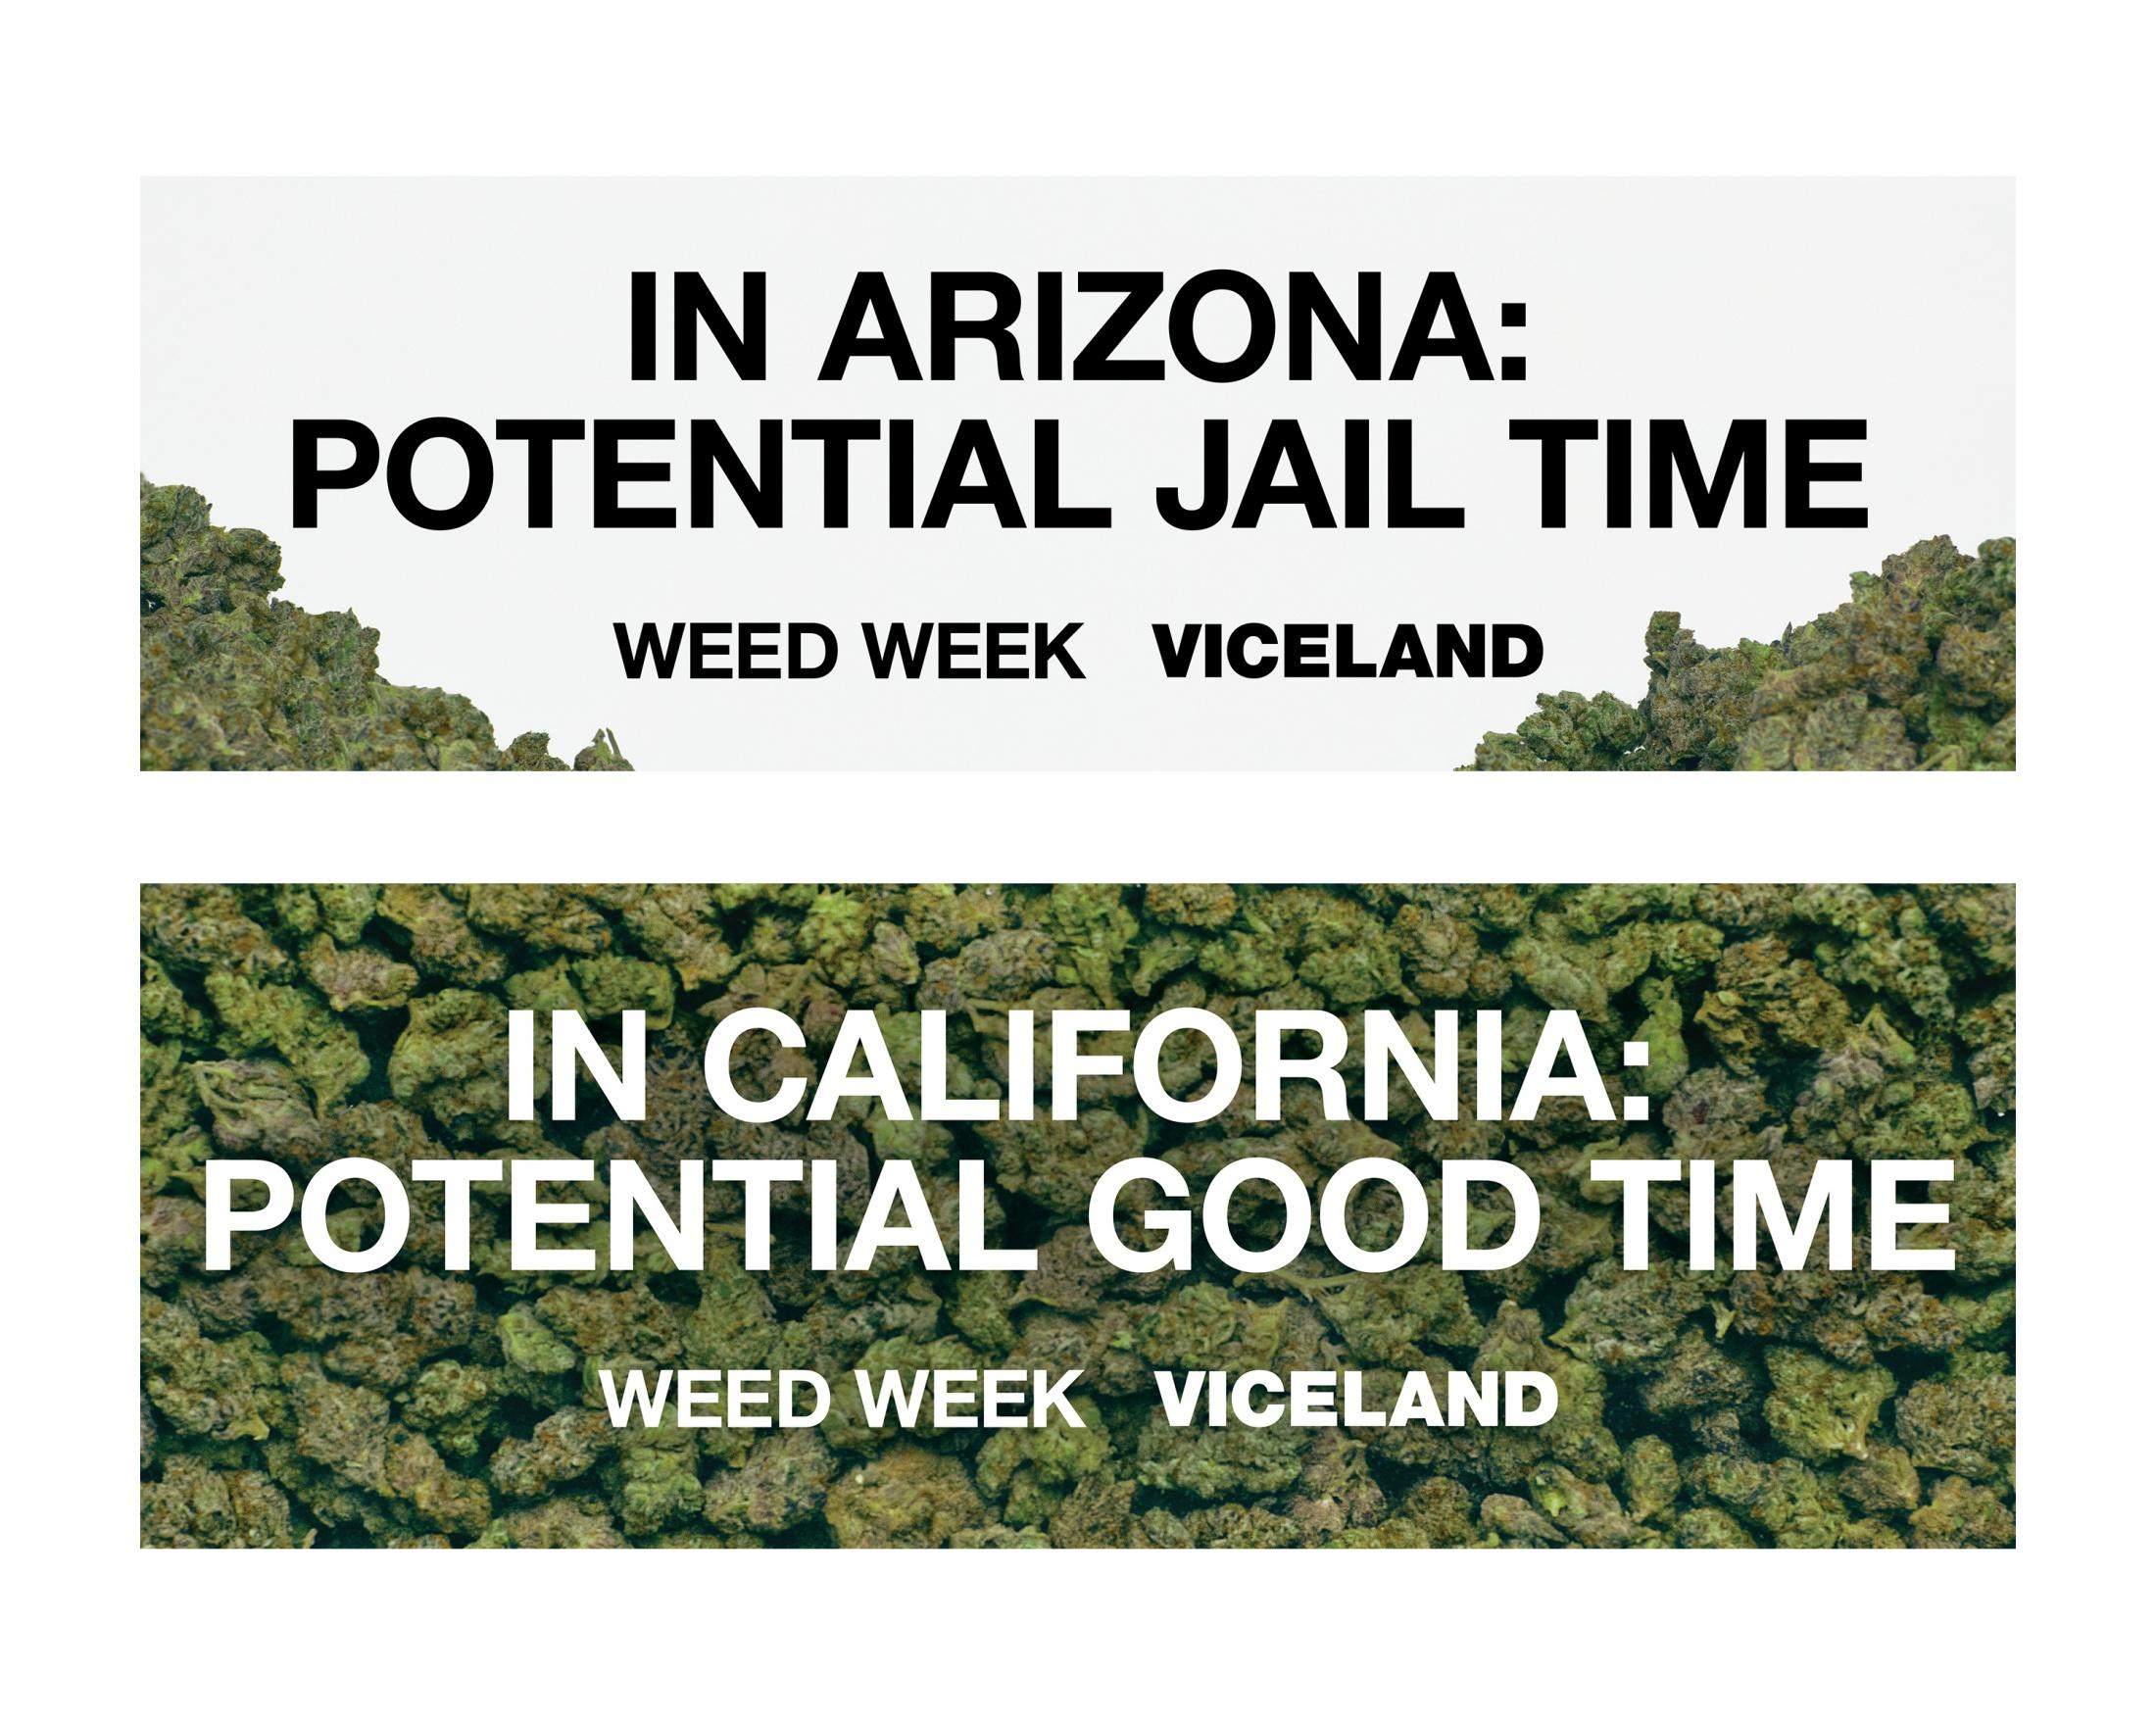 Thumbnail for VICELAND On The Border Of Marijuana Legislation